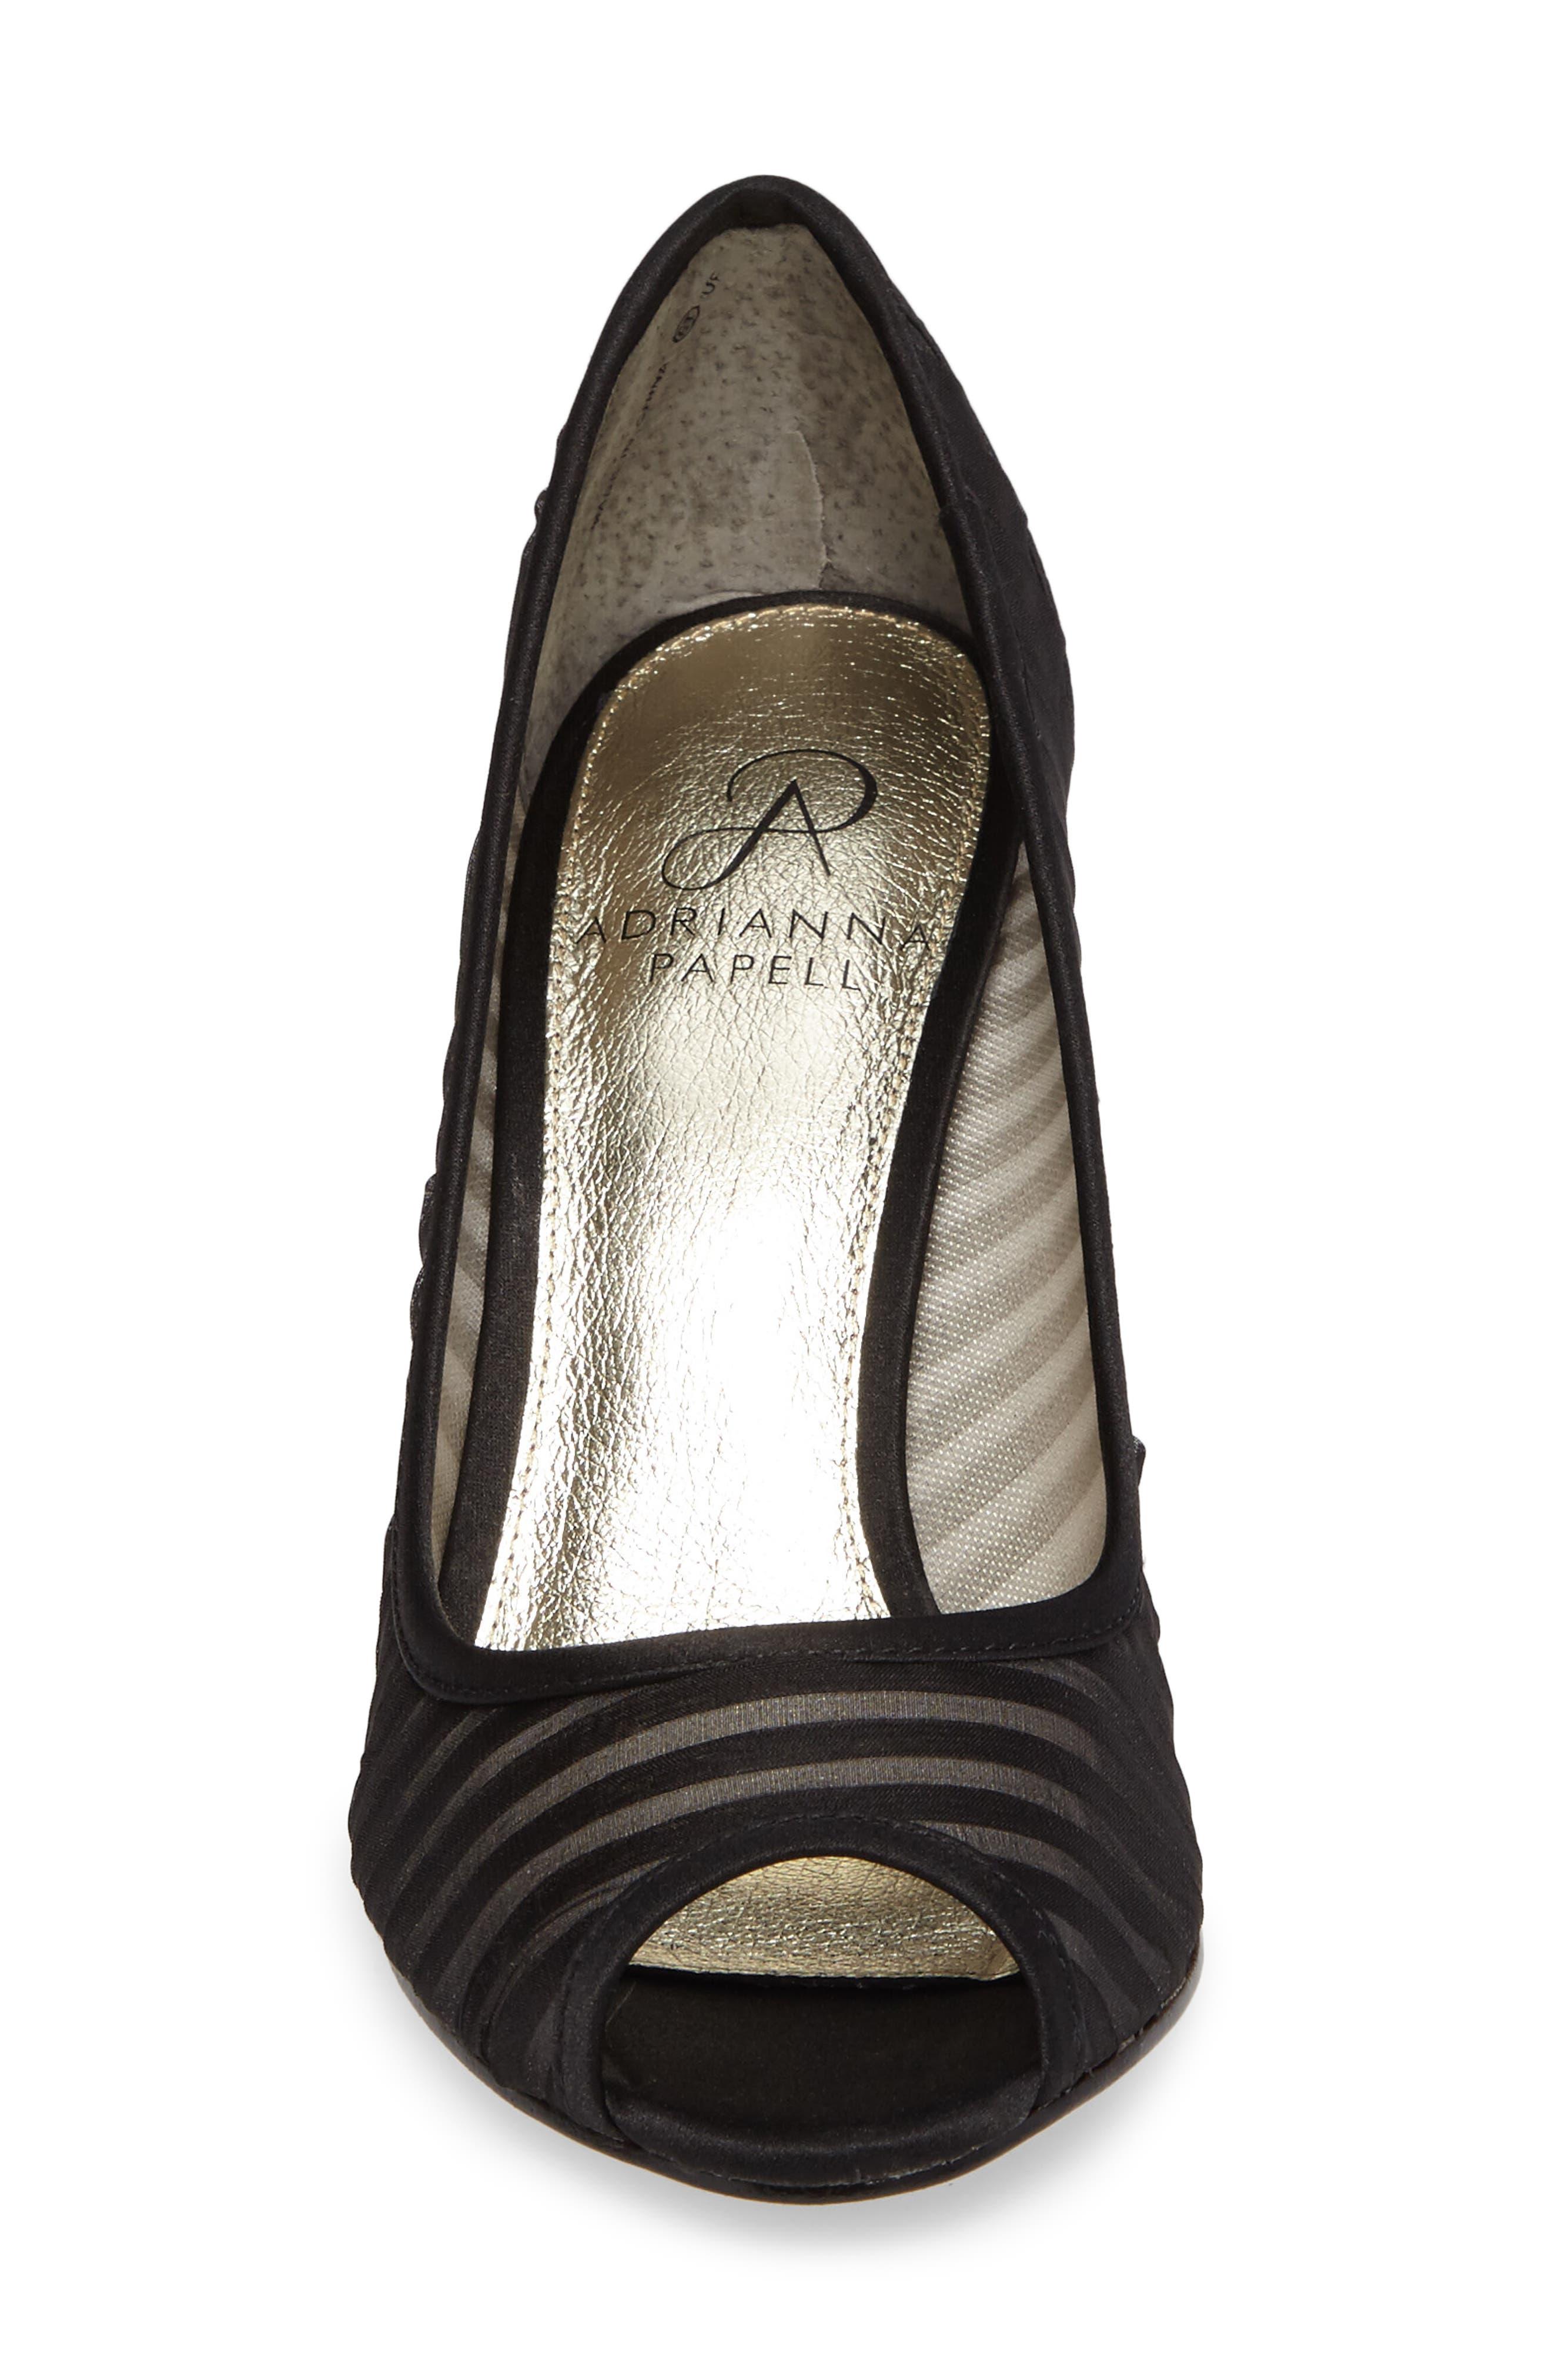 Alternate Image 4  - Adrianna Papell Flirt Peep Toe Pump (Women)